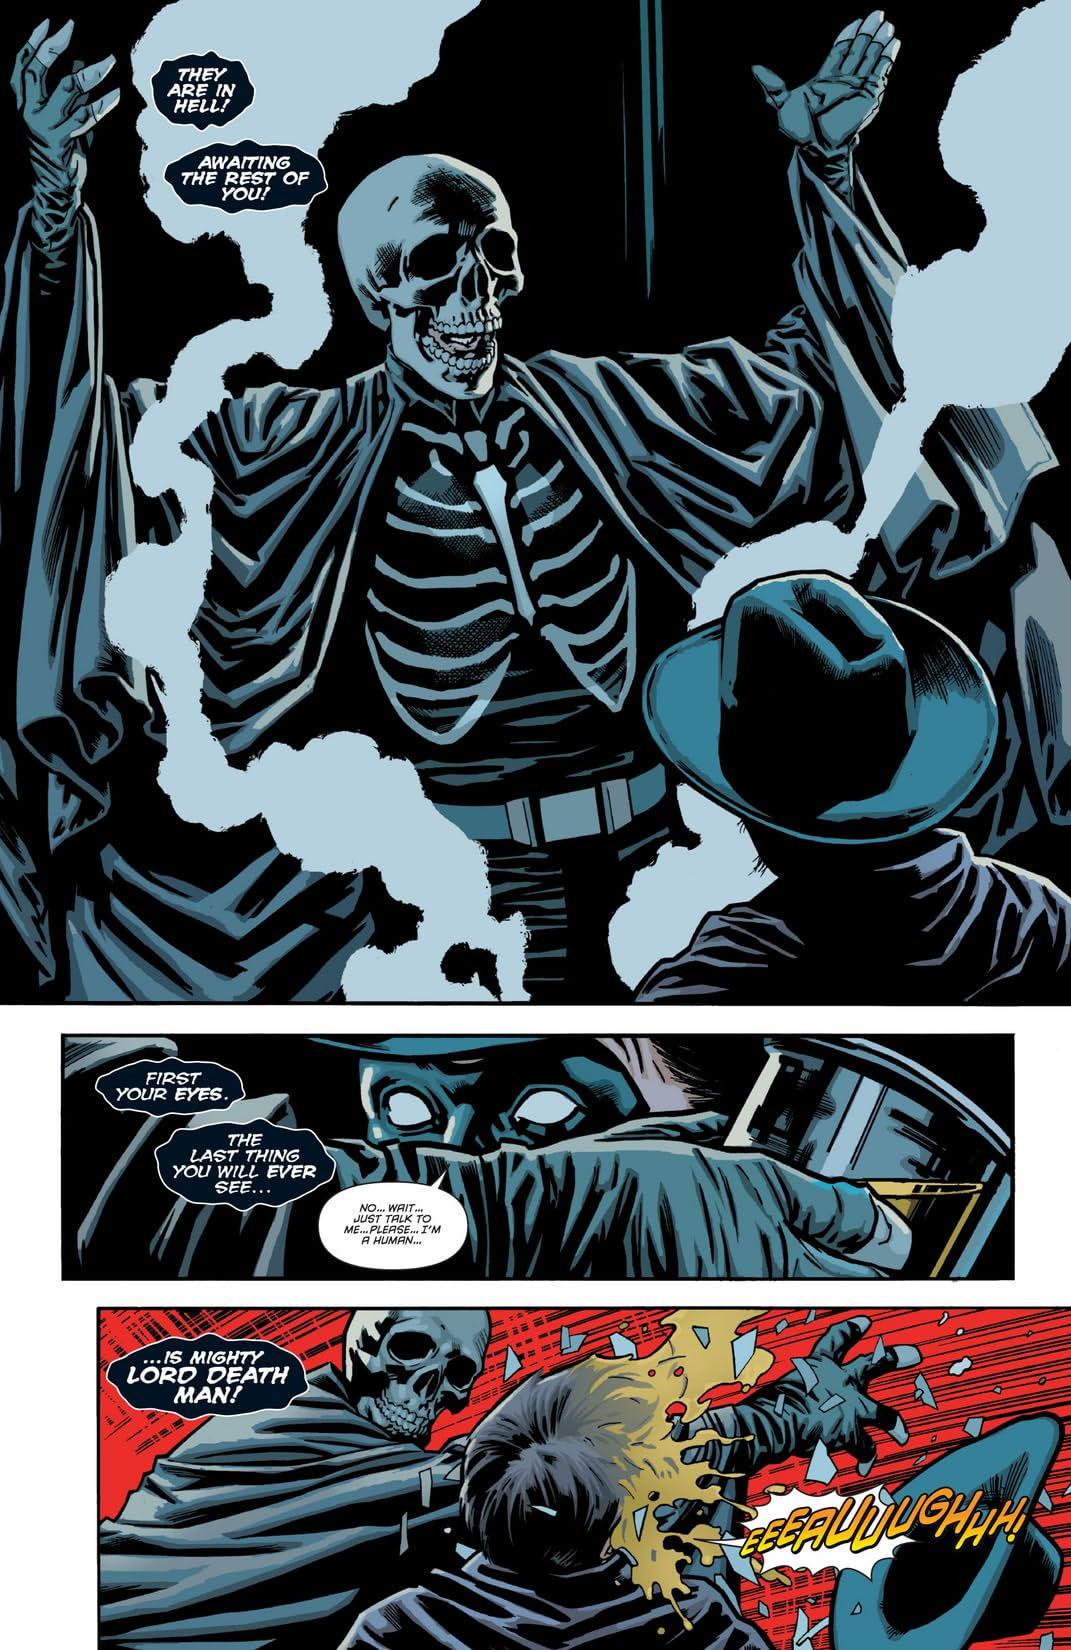 Batman Incorporated (2010-2011) Vol. 1: Deluxe